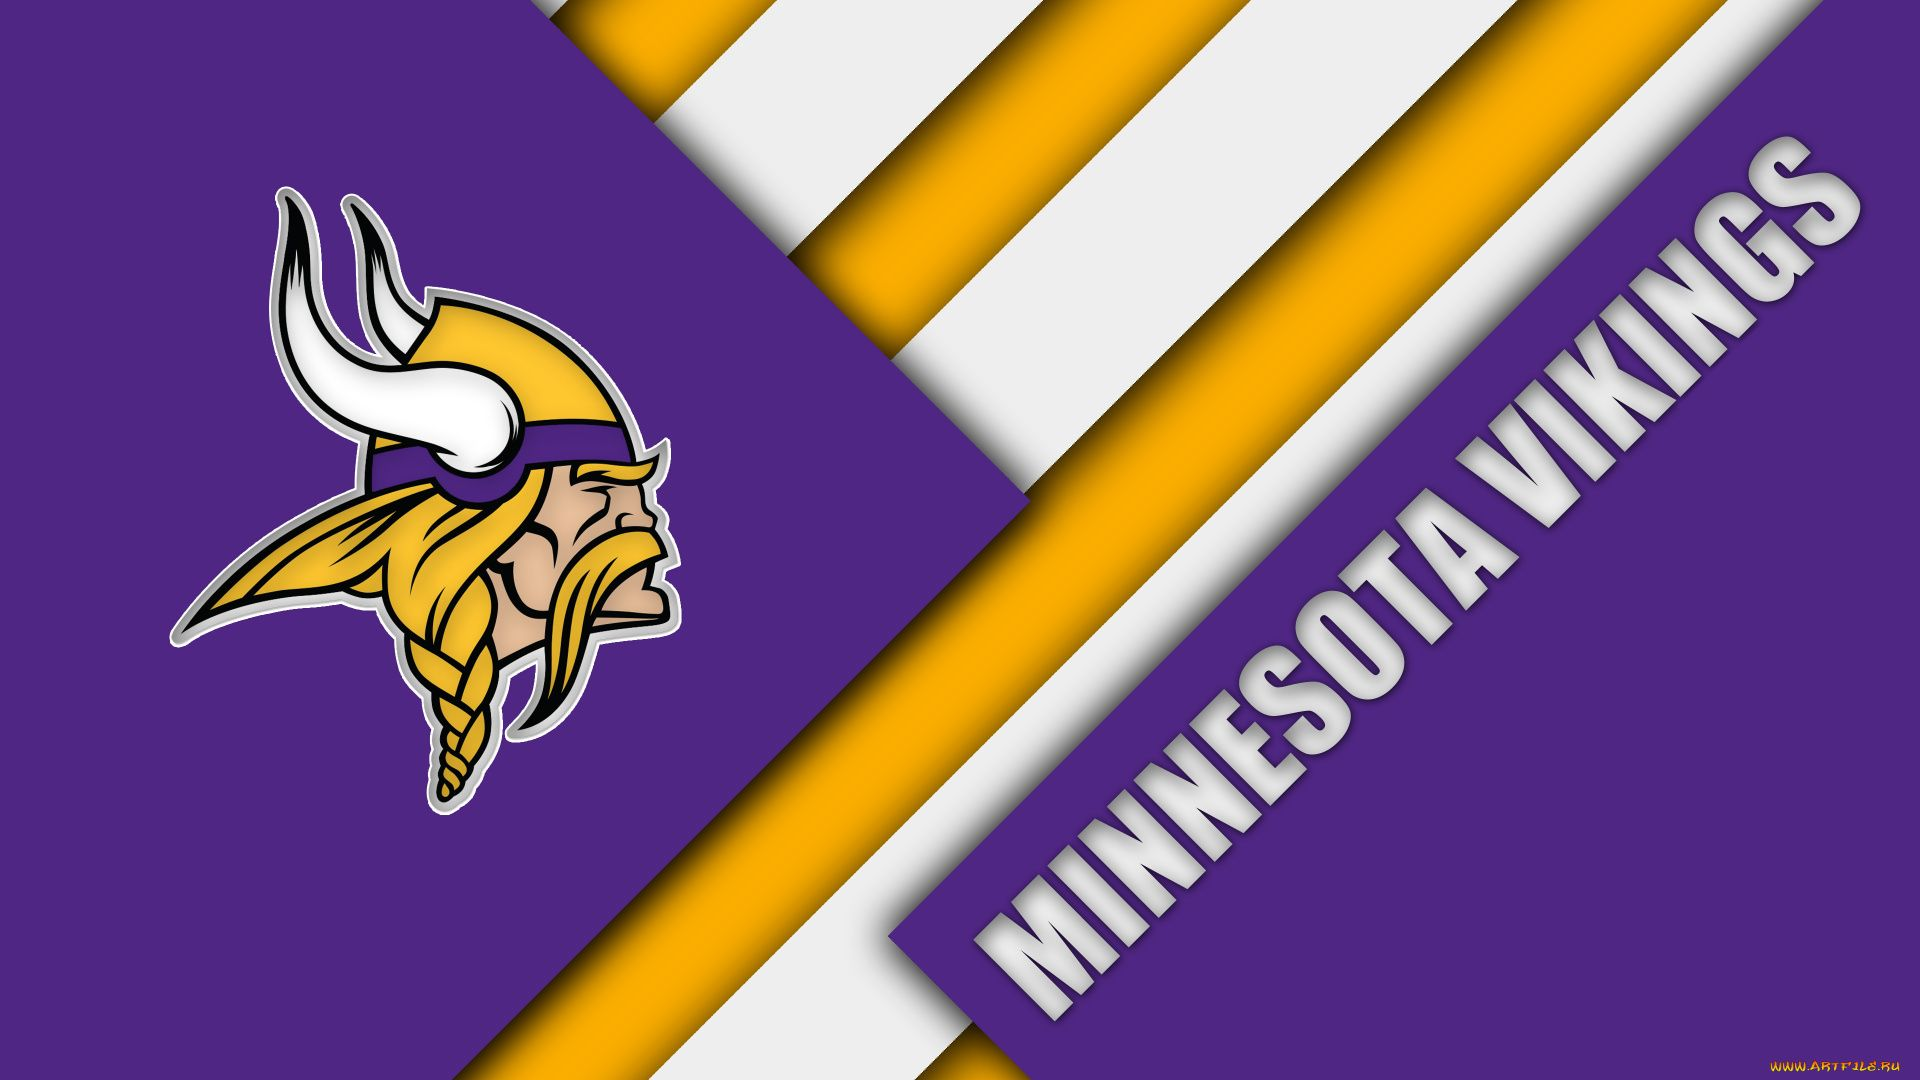 Minnesota Vikings picture wallpaper